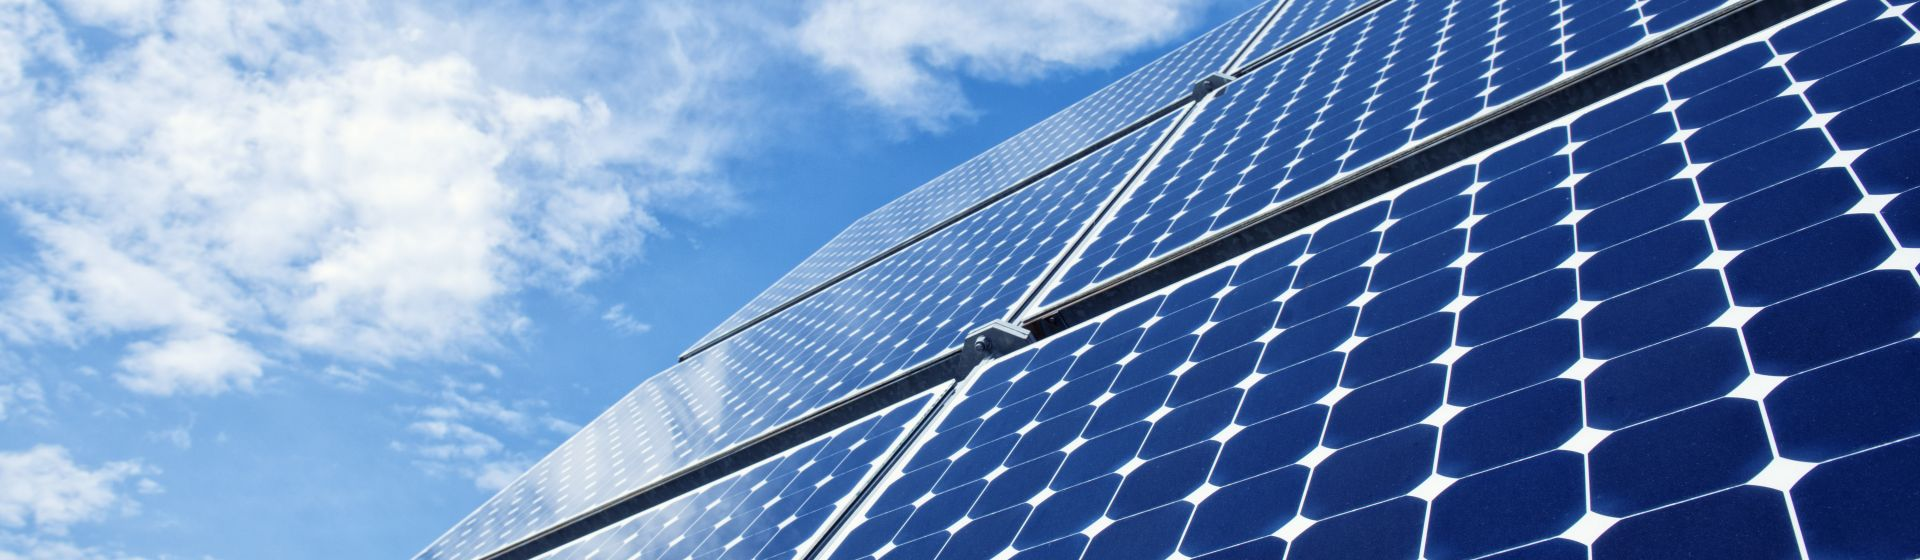 Solar-Energy-184004861_6000x4004